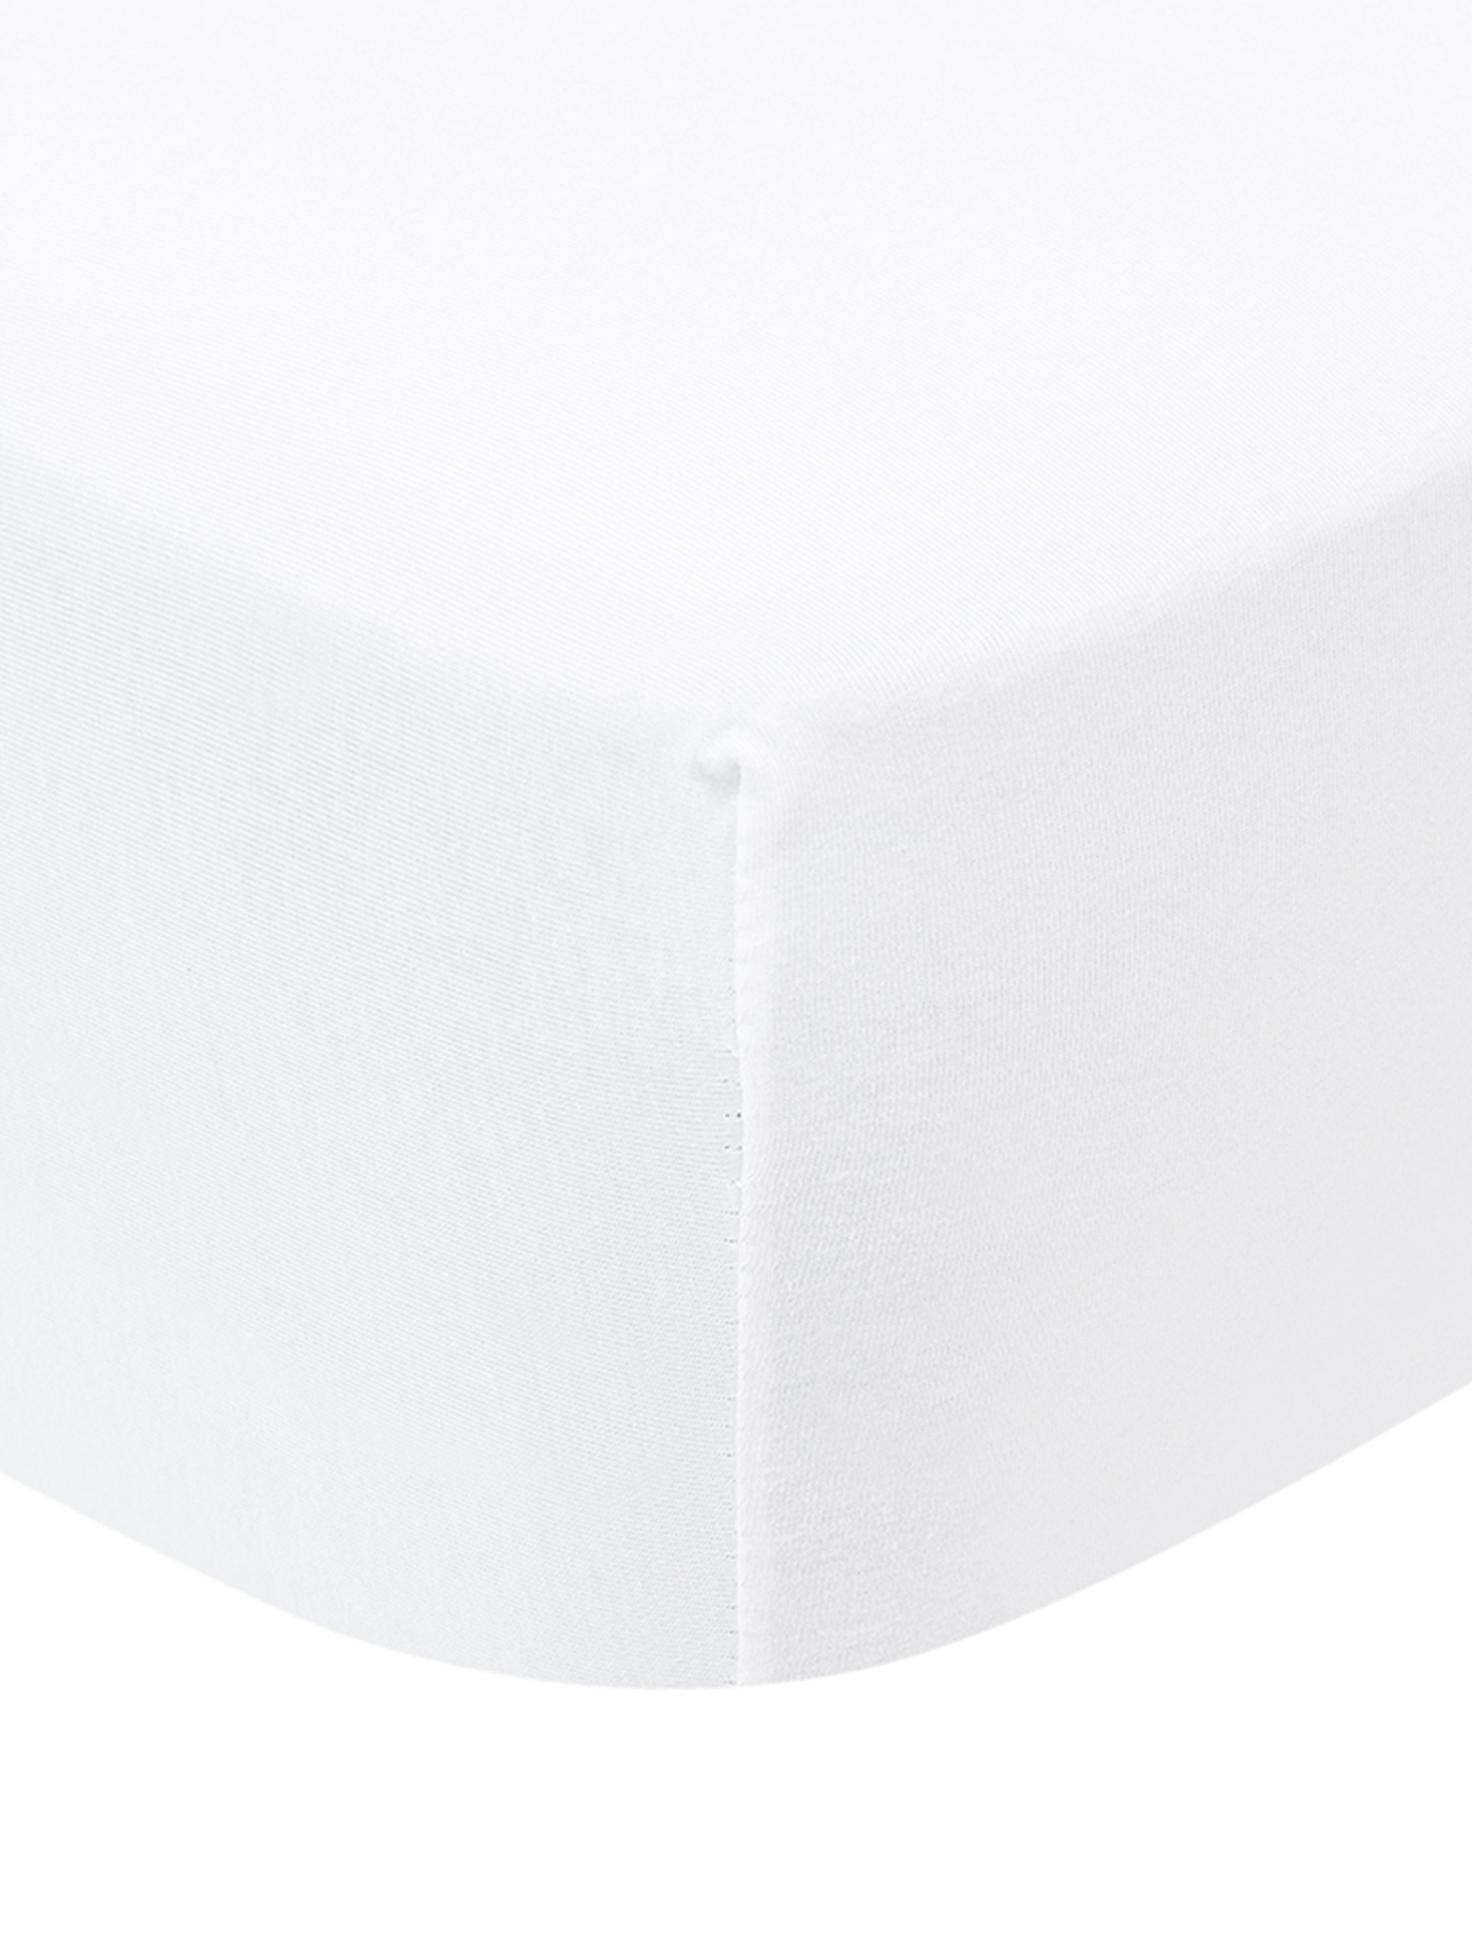 Boxspring-Spannbettlaken Lara, Jersey-Elasthan, 95% Baumwolle, 5% Elasthan, Weiß, 180 x 200 cm